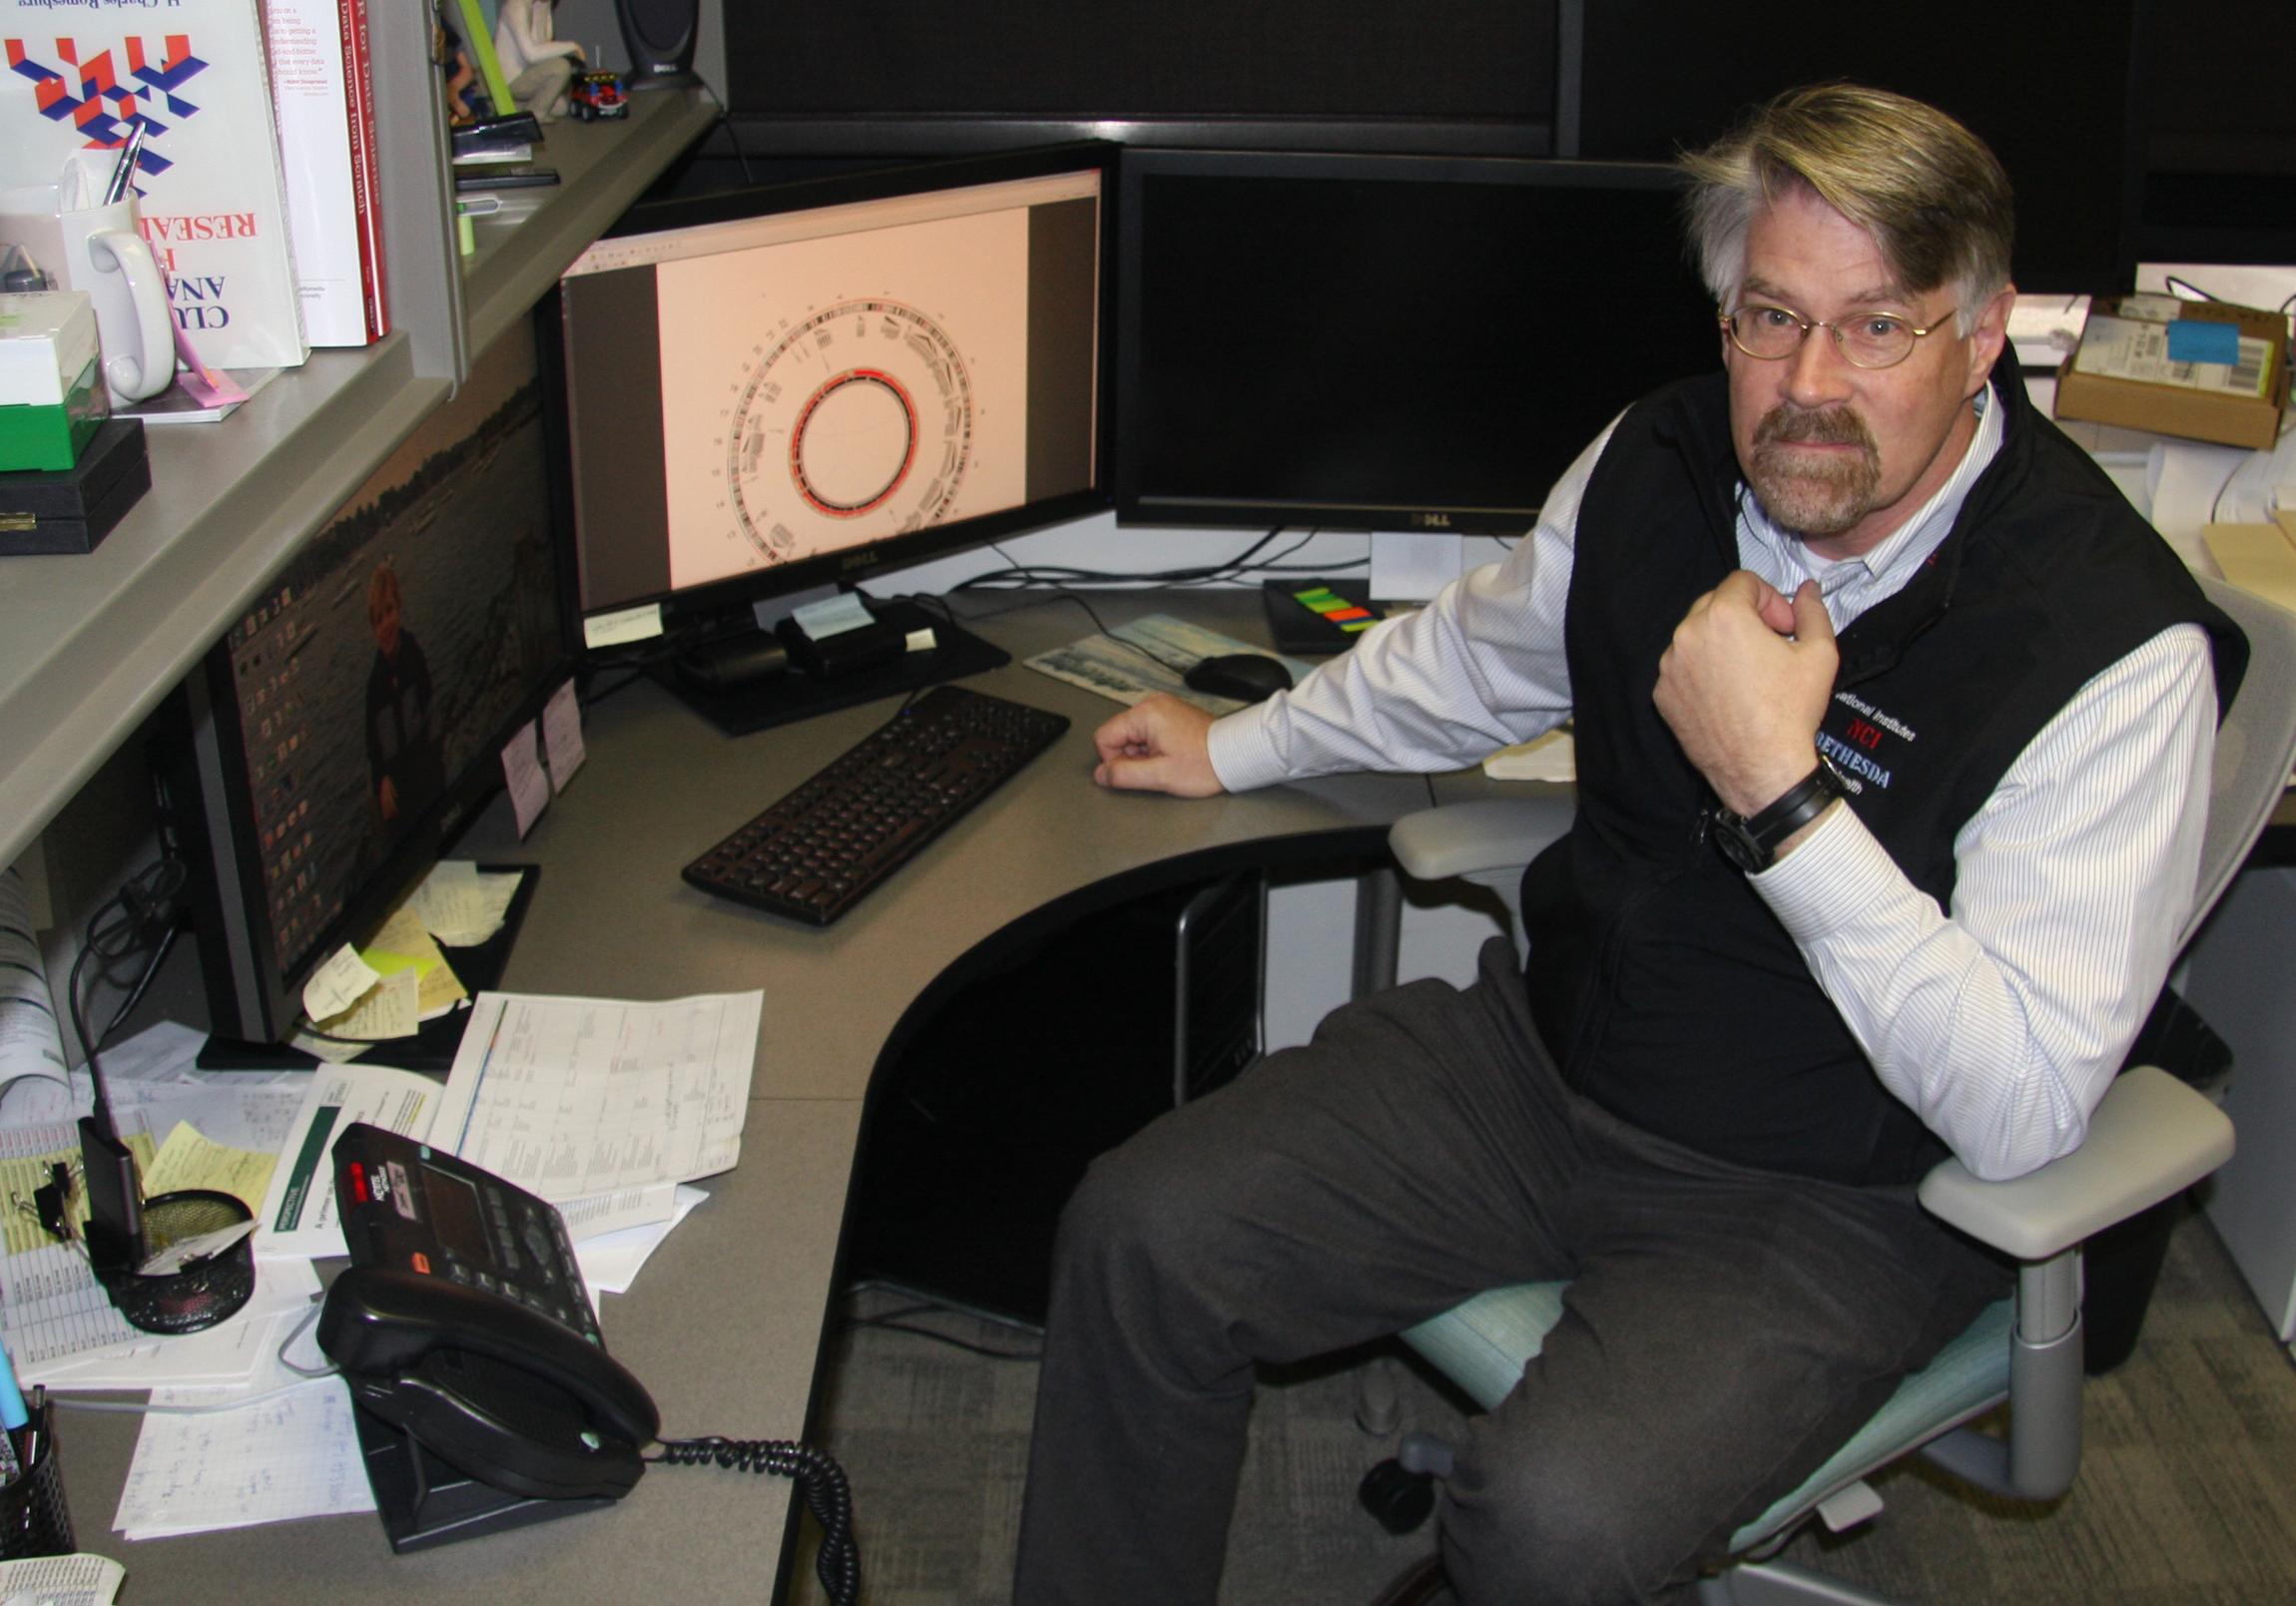 Dr. Johann at desk